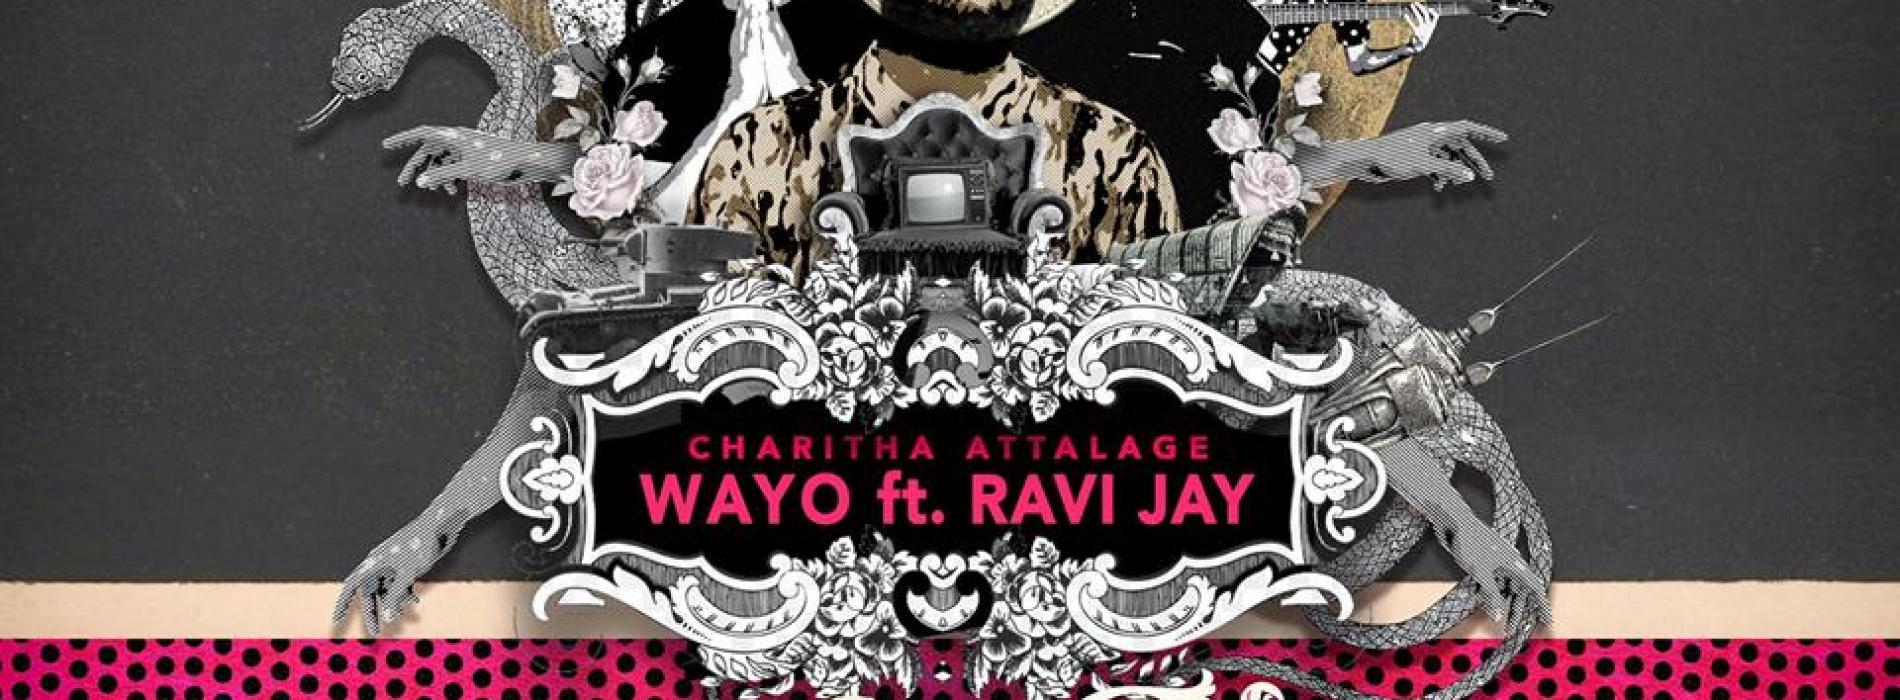 SuckDevi Vanuma (සක්දෙවි වැනුම) – WAYO Ft Ravi Jay & Charitha Attalage [Official Music Video]